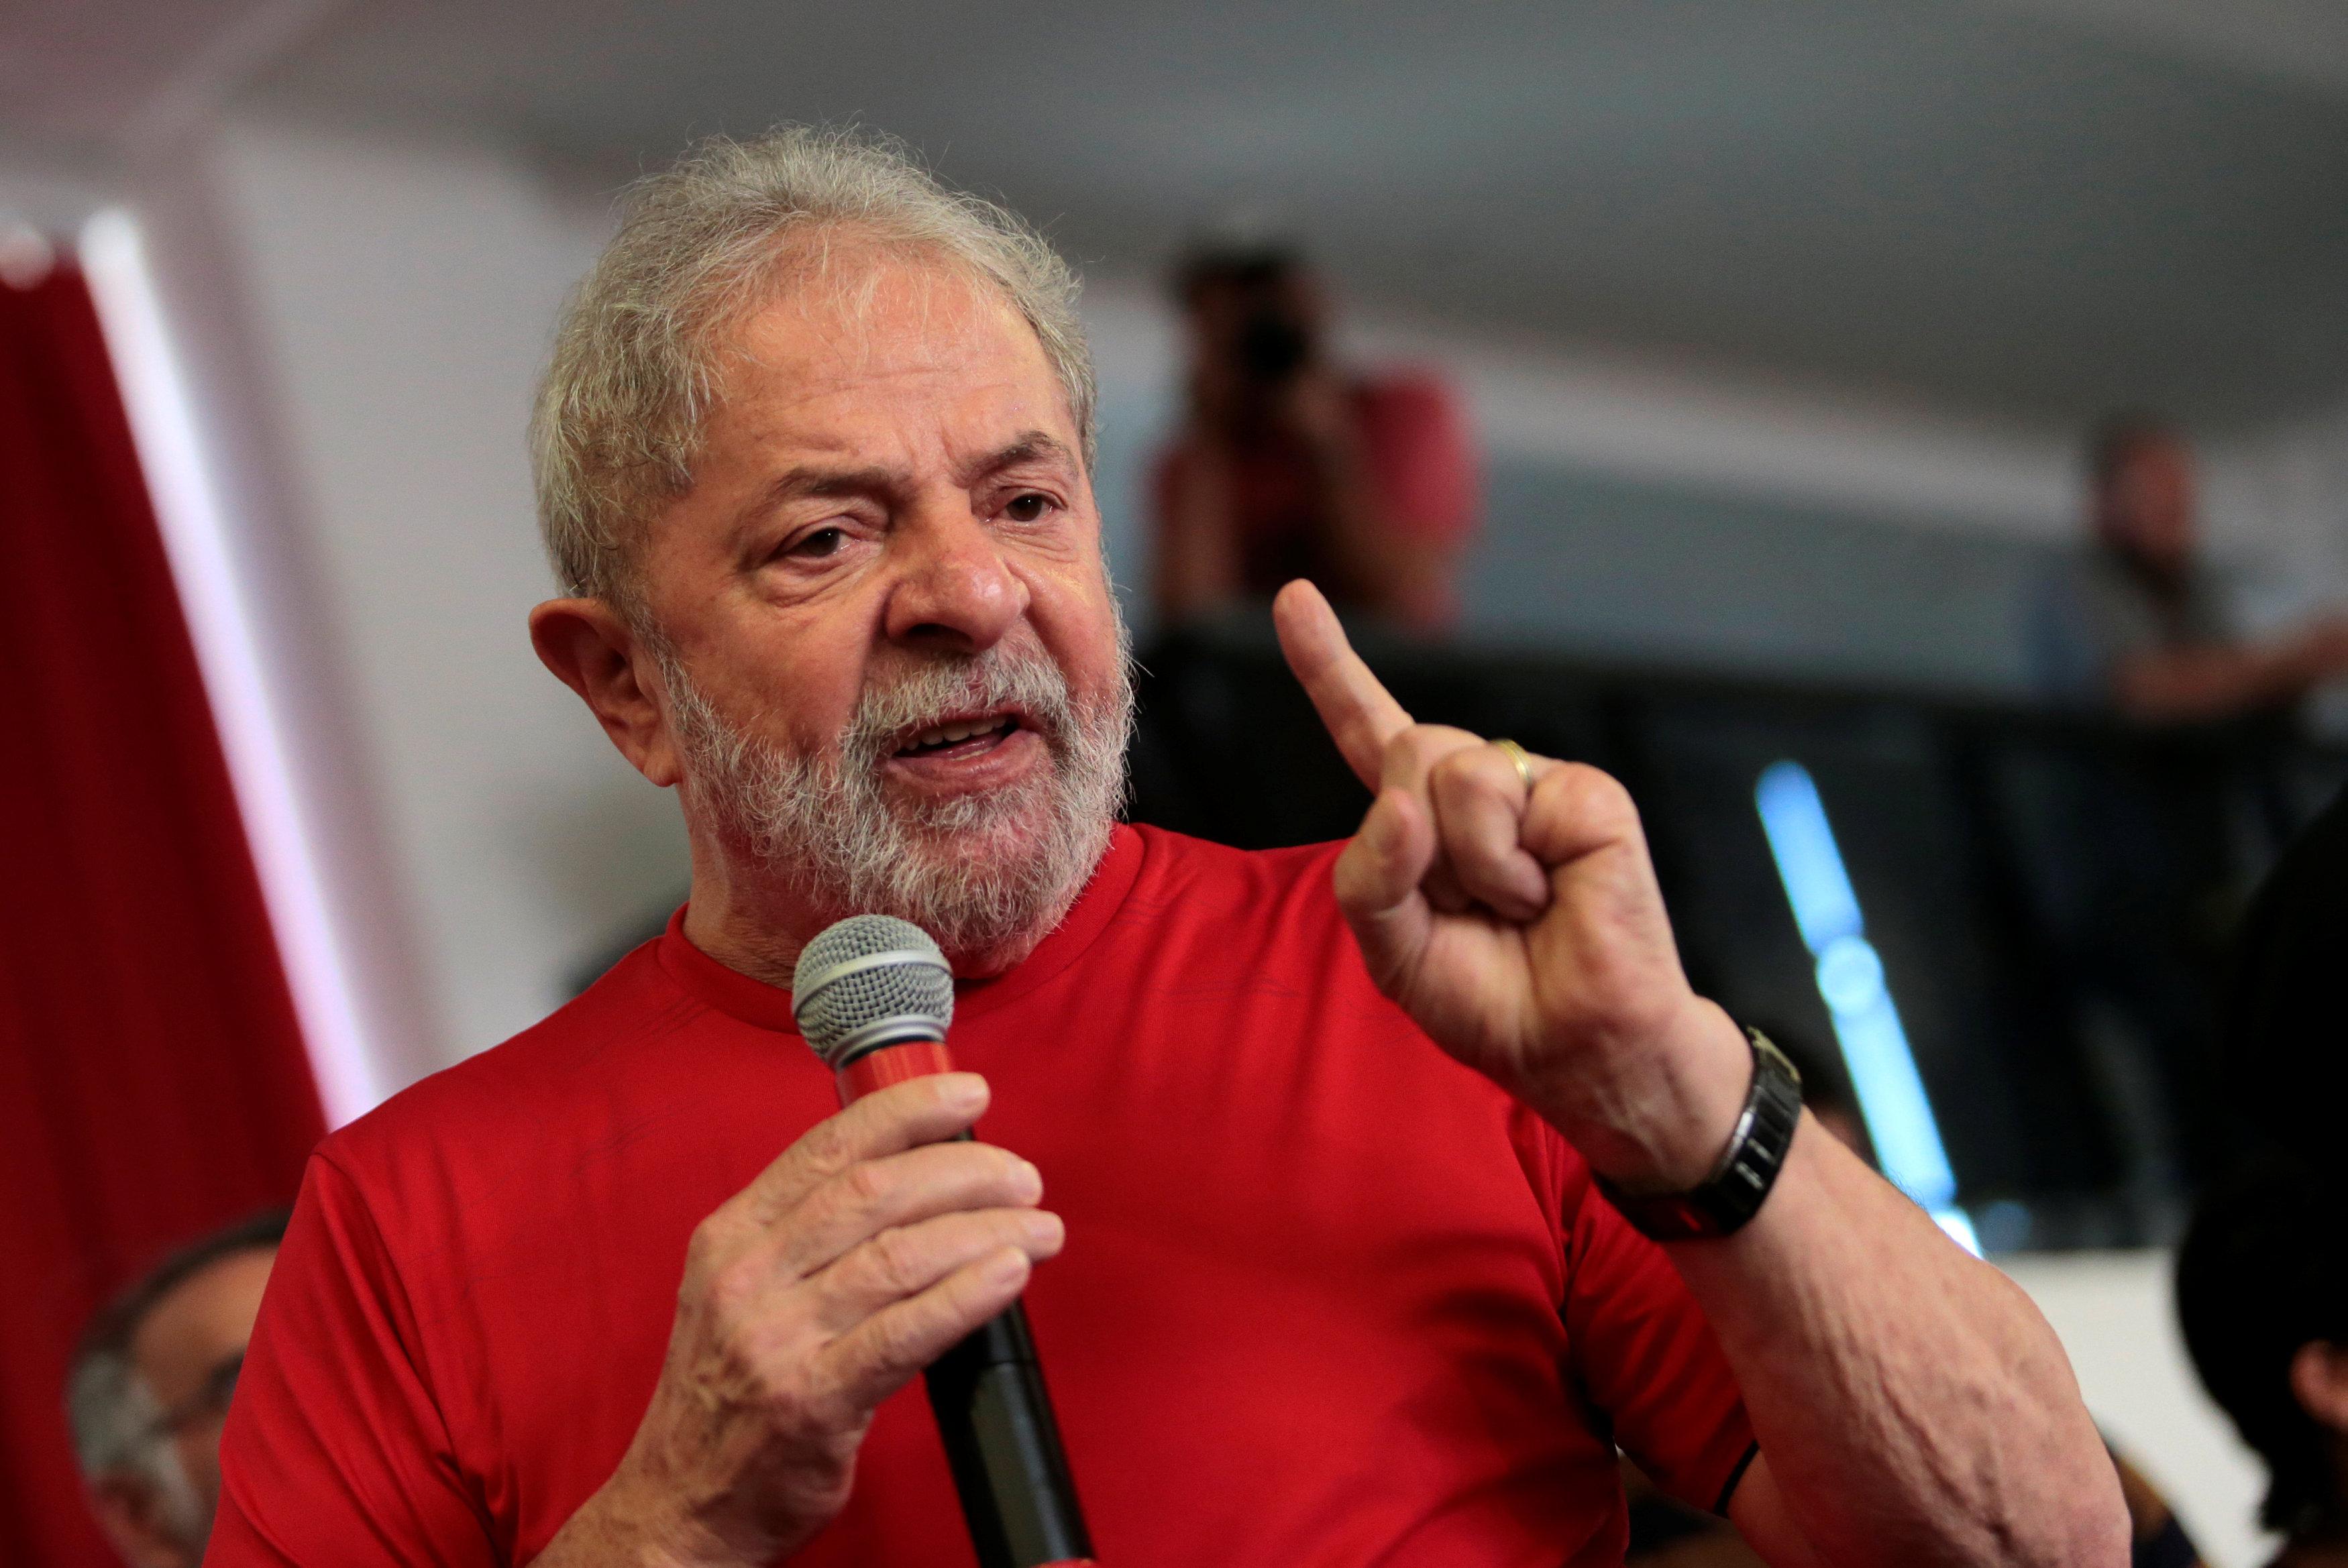 Juiz do TRF1 libera passaporte do ex-presidente Lula | Agência Brasil